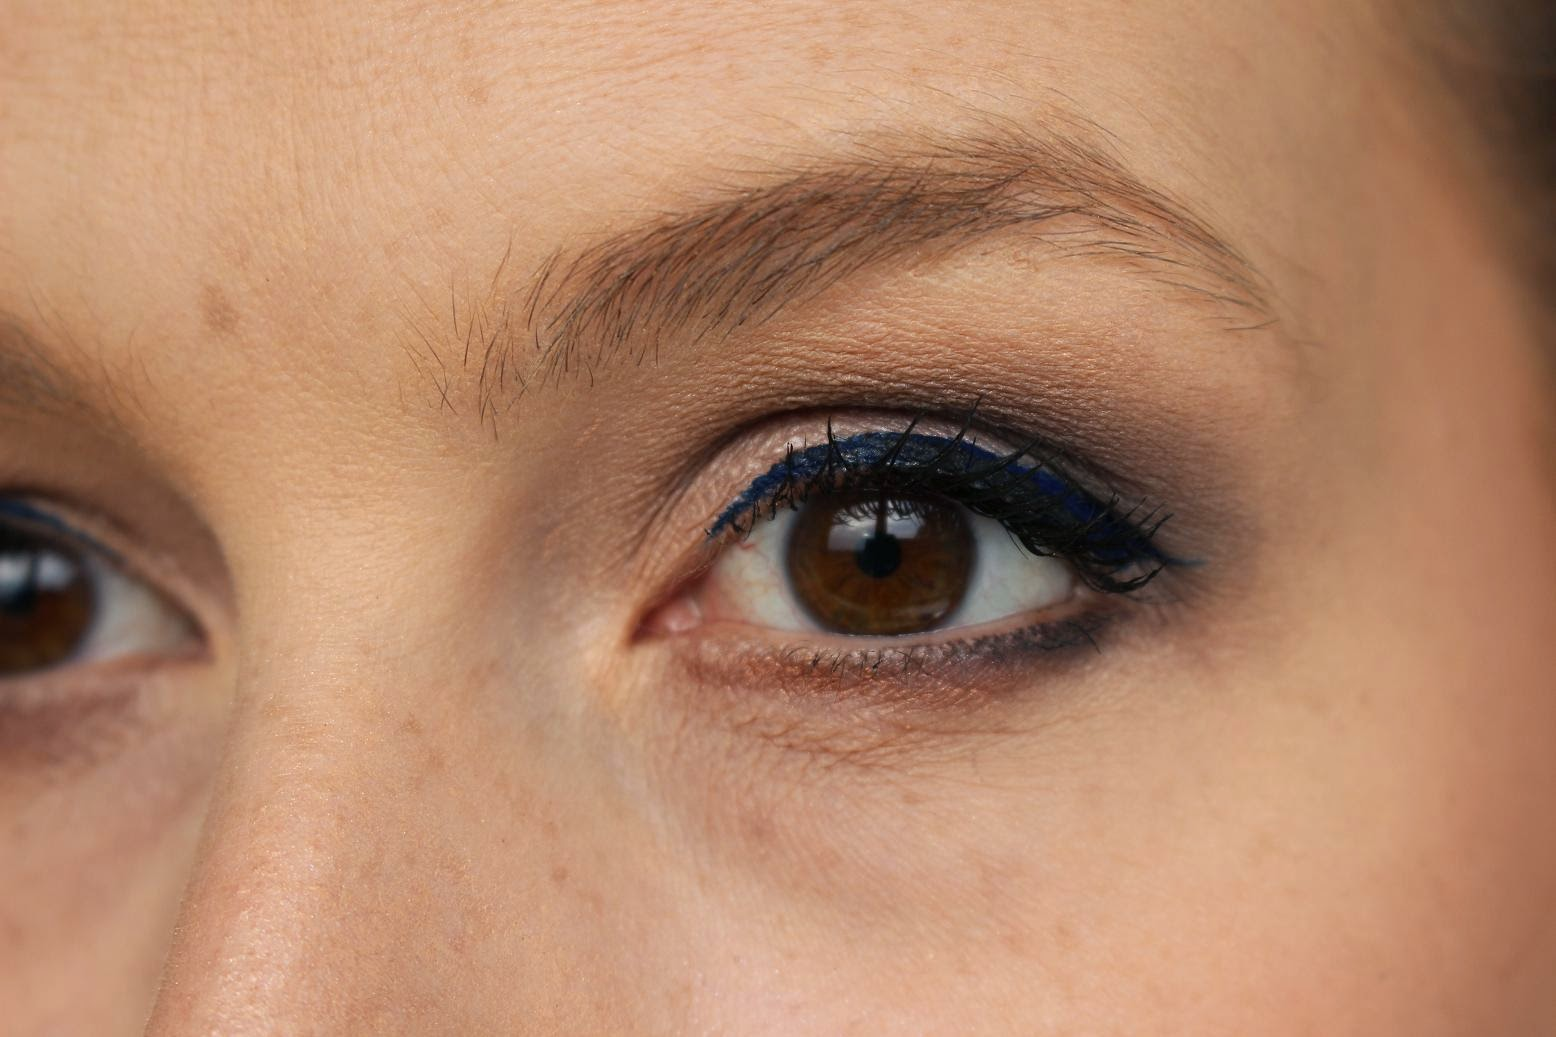 The NARSissist Eyeshadow Palette